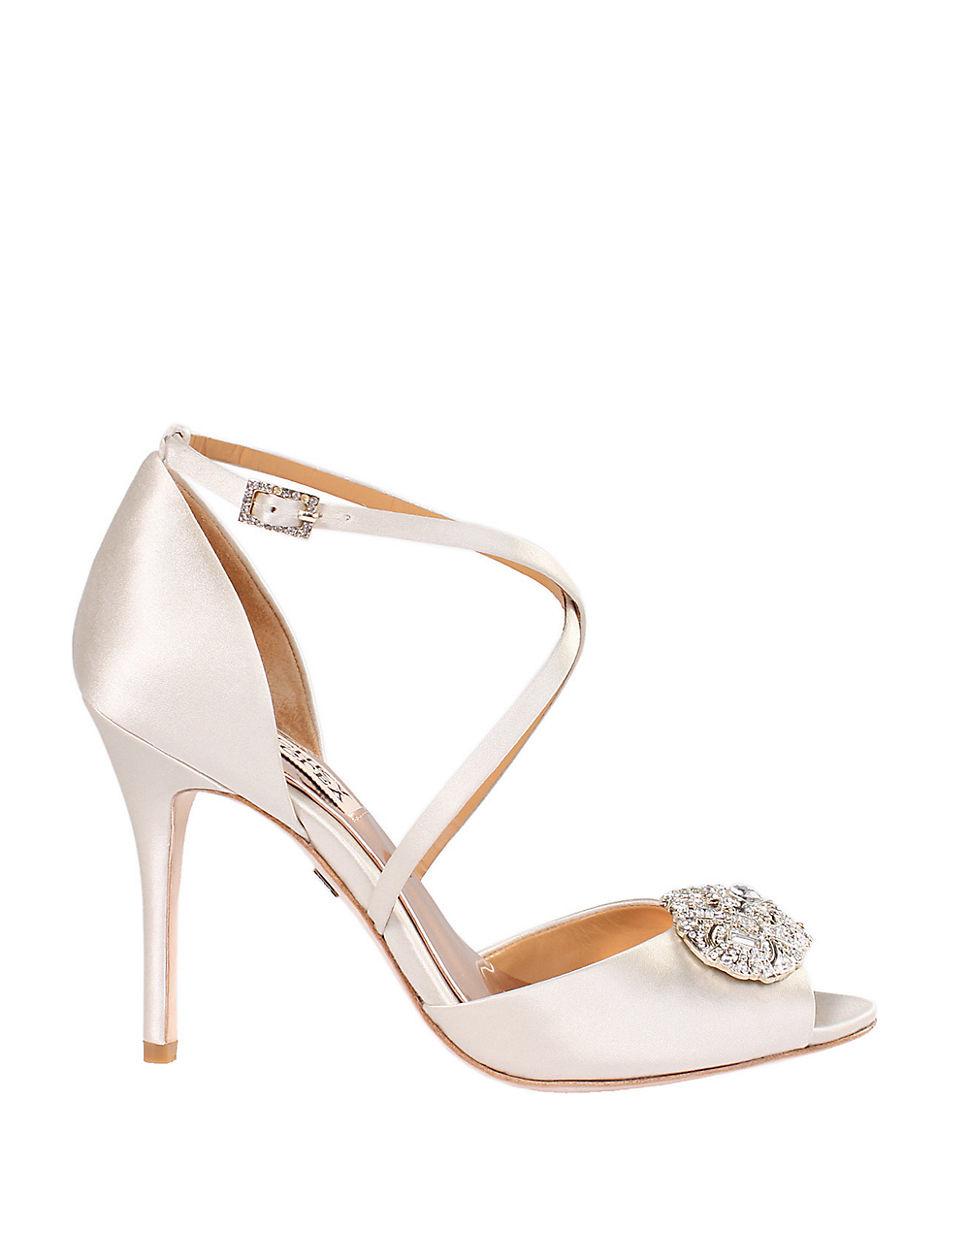 badgley mischka sari peep toe pumps in white lyst